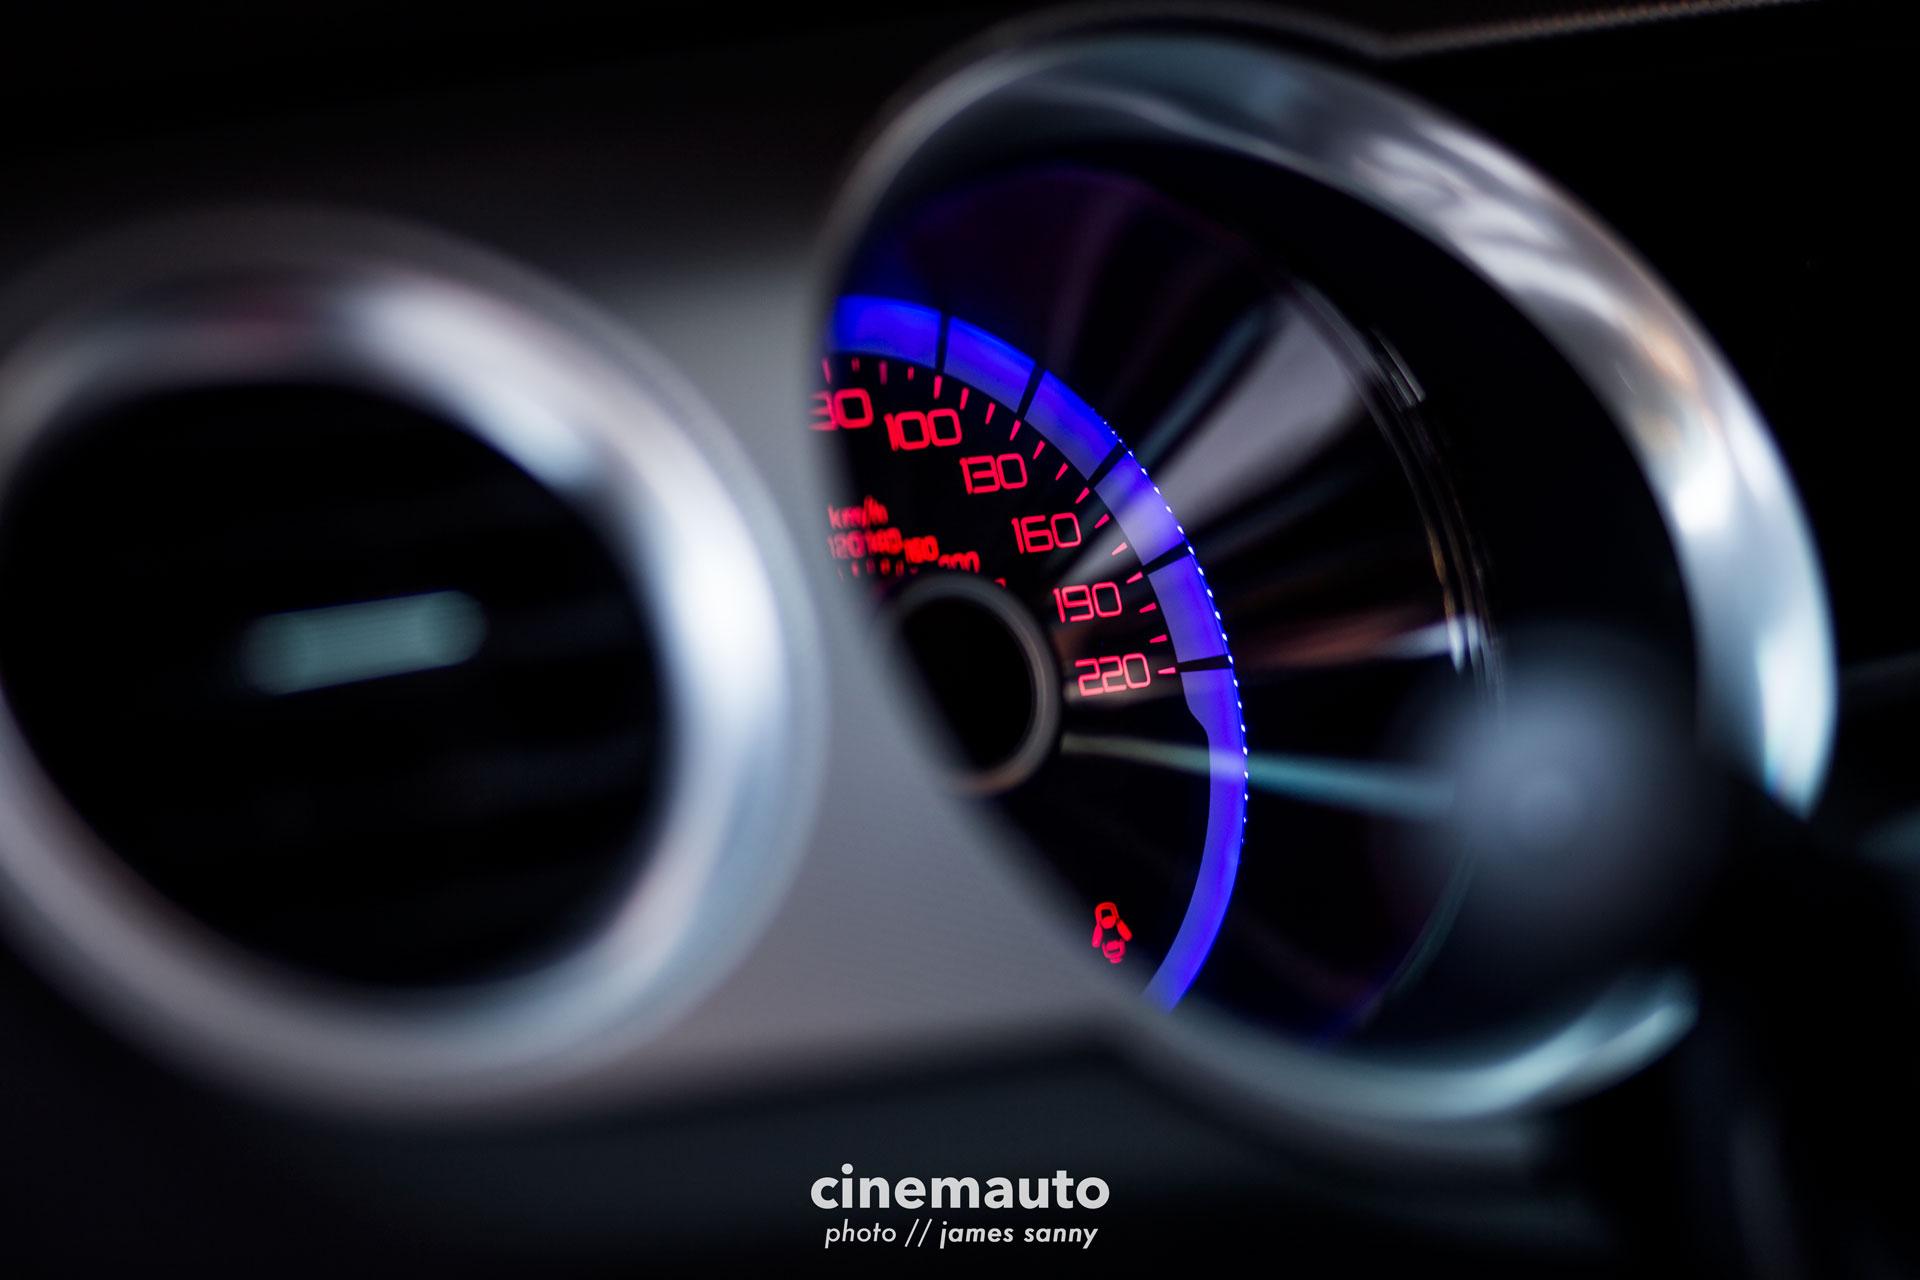 cinemauto-wichita-automotive-photography-cj6a.jpg